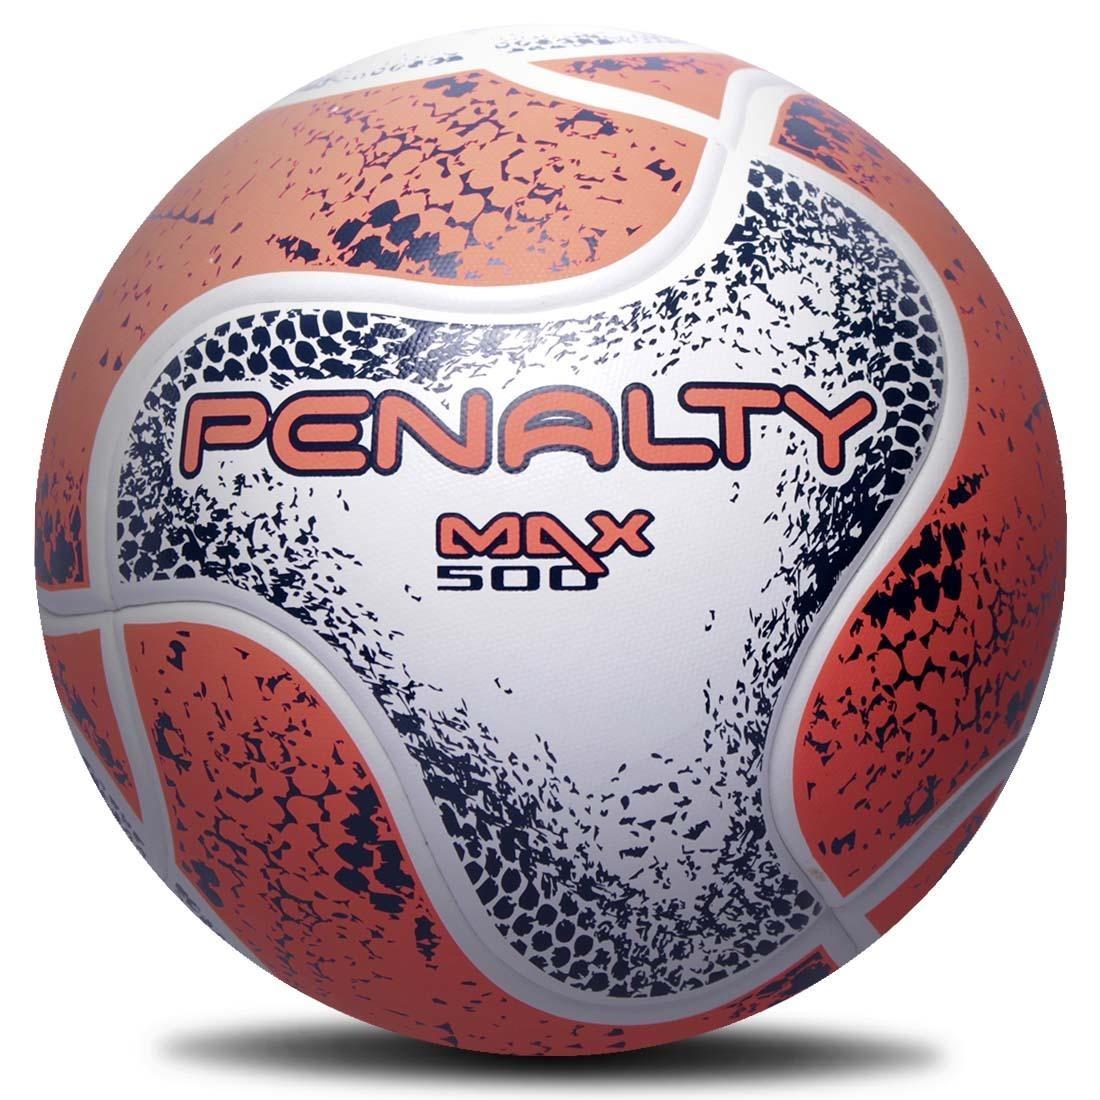 3d8462af48 Carregando zoom... kit 3 bolas futsal penalty max 500 termotec 2018